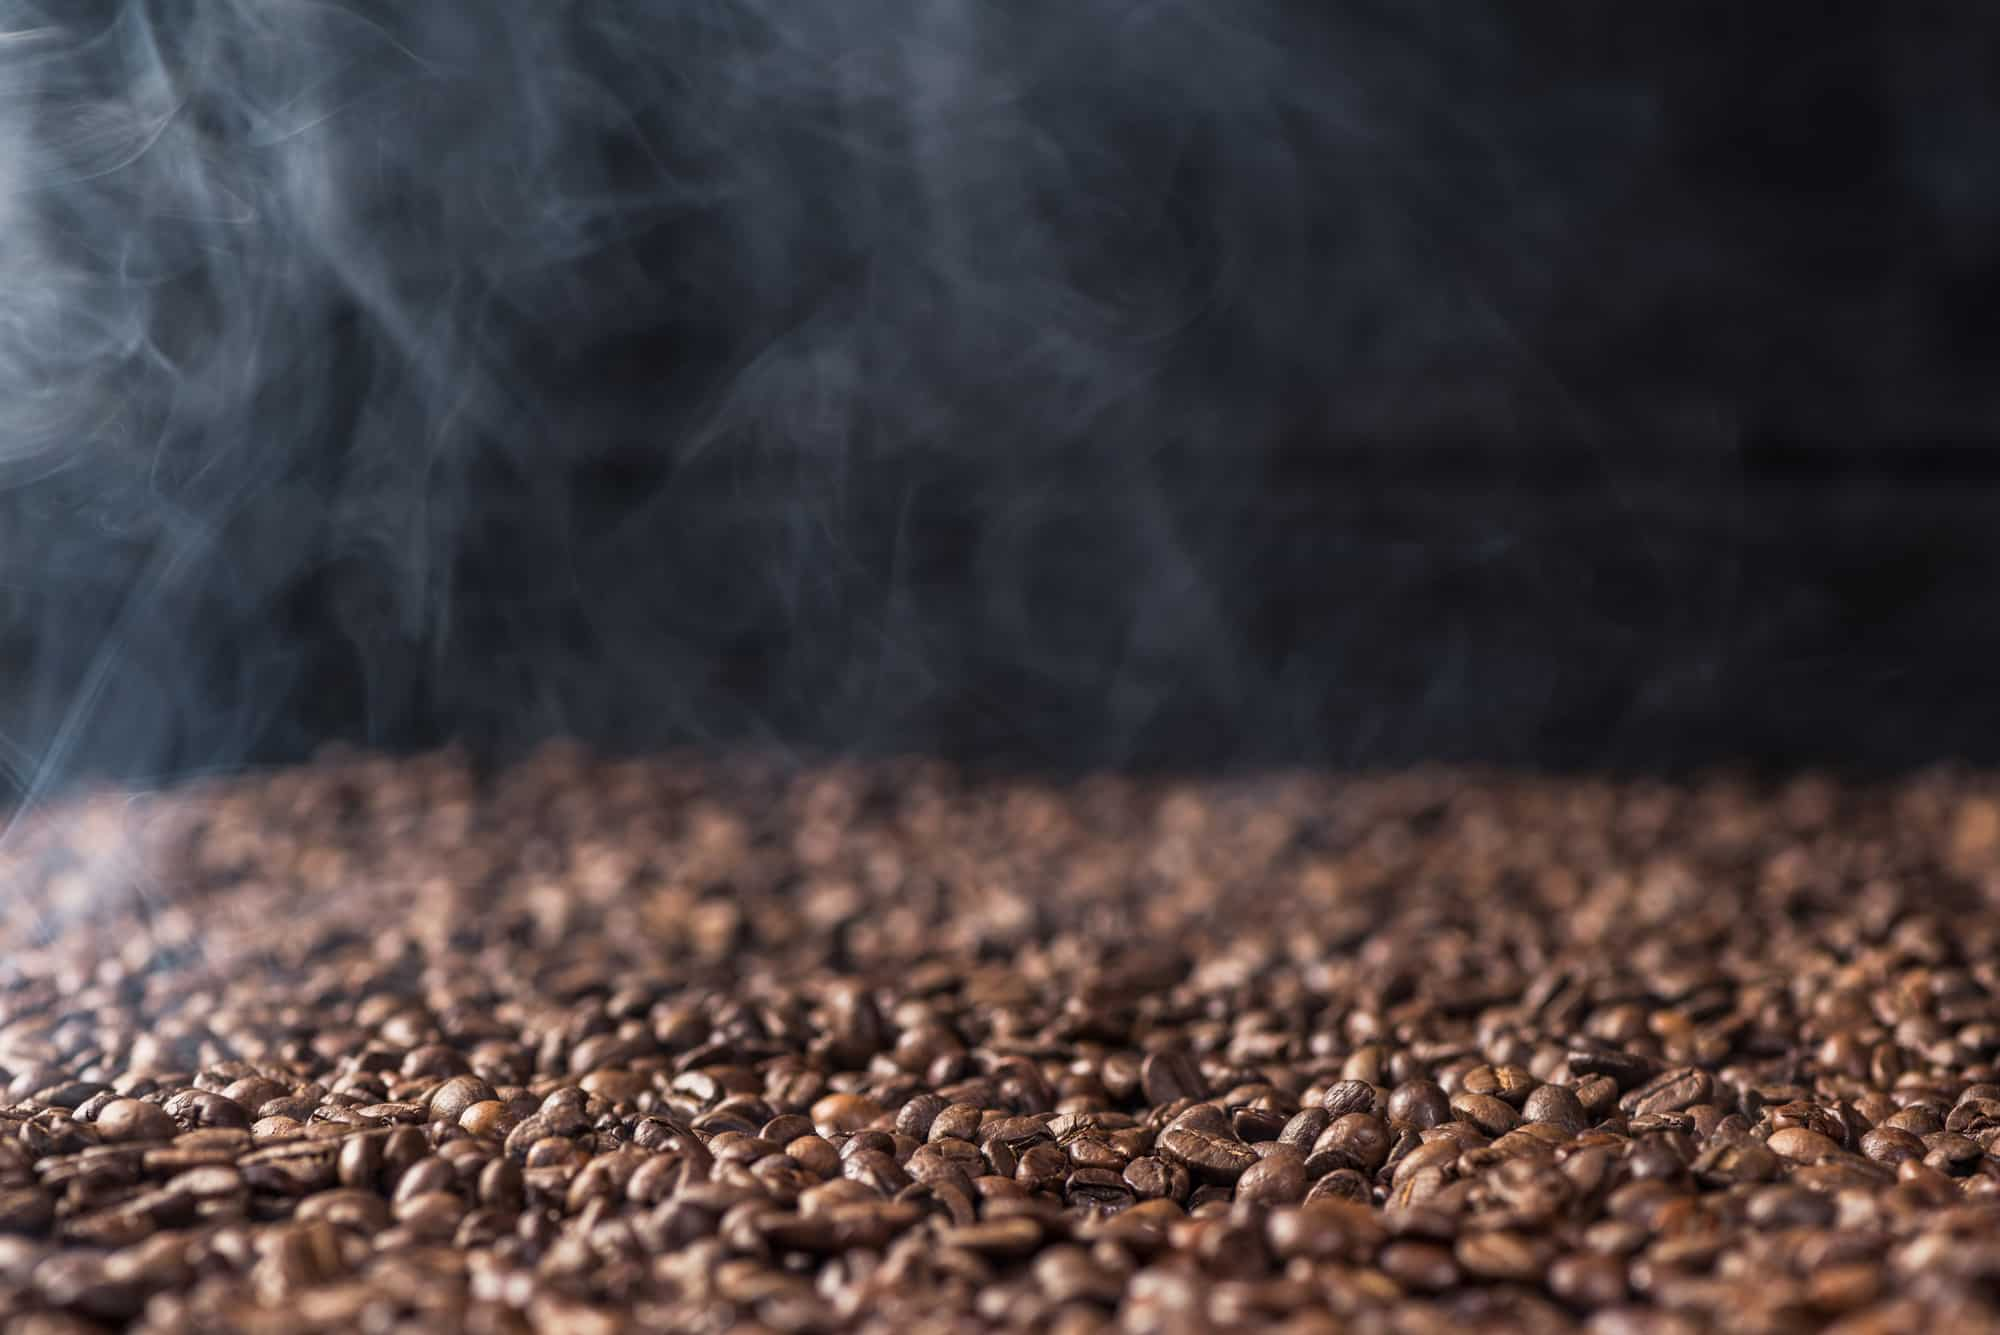 Freshly roasted decaf coffee